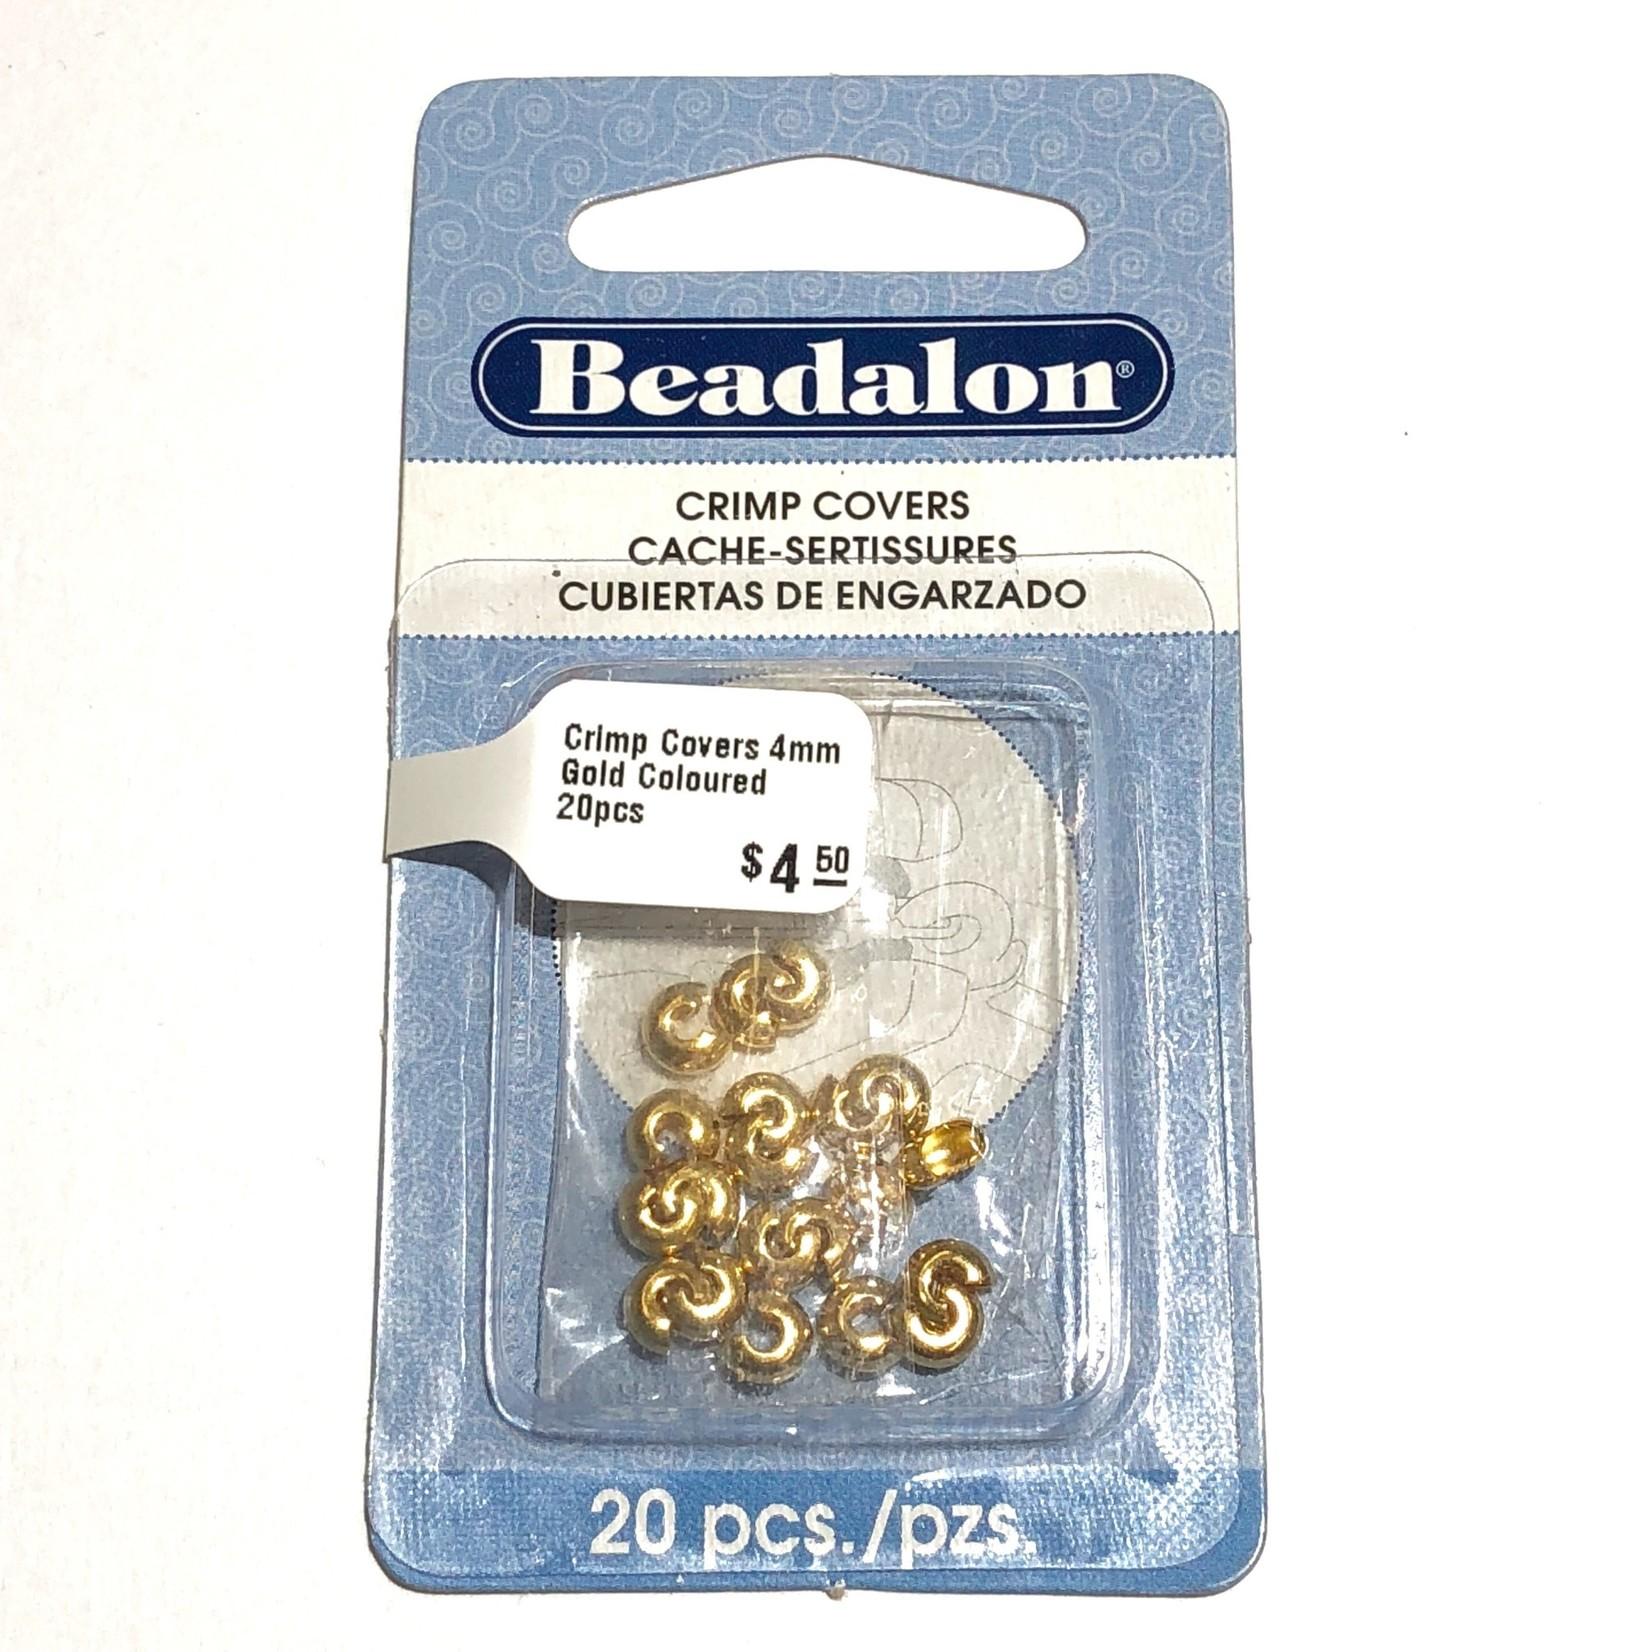 Beadalon Crimp Covers 4mm Gold Coloured 20pcs